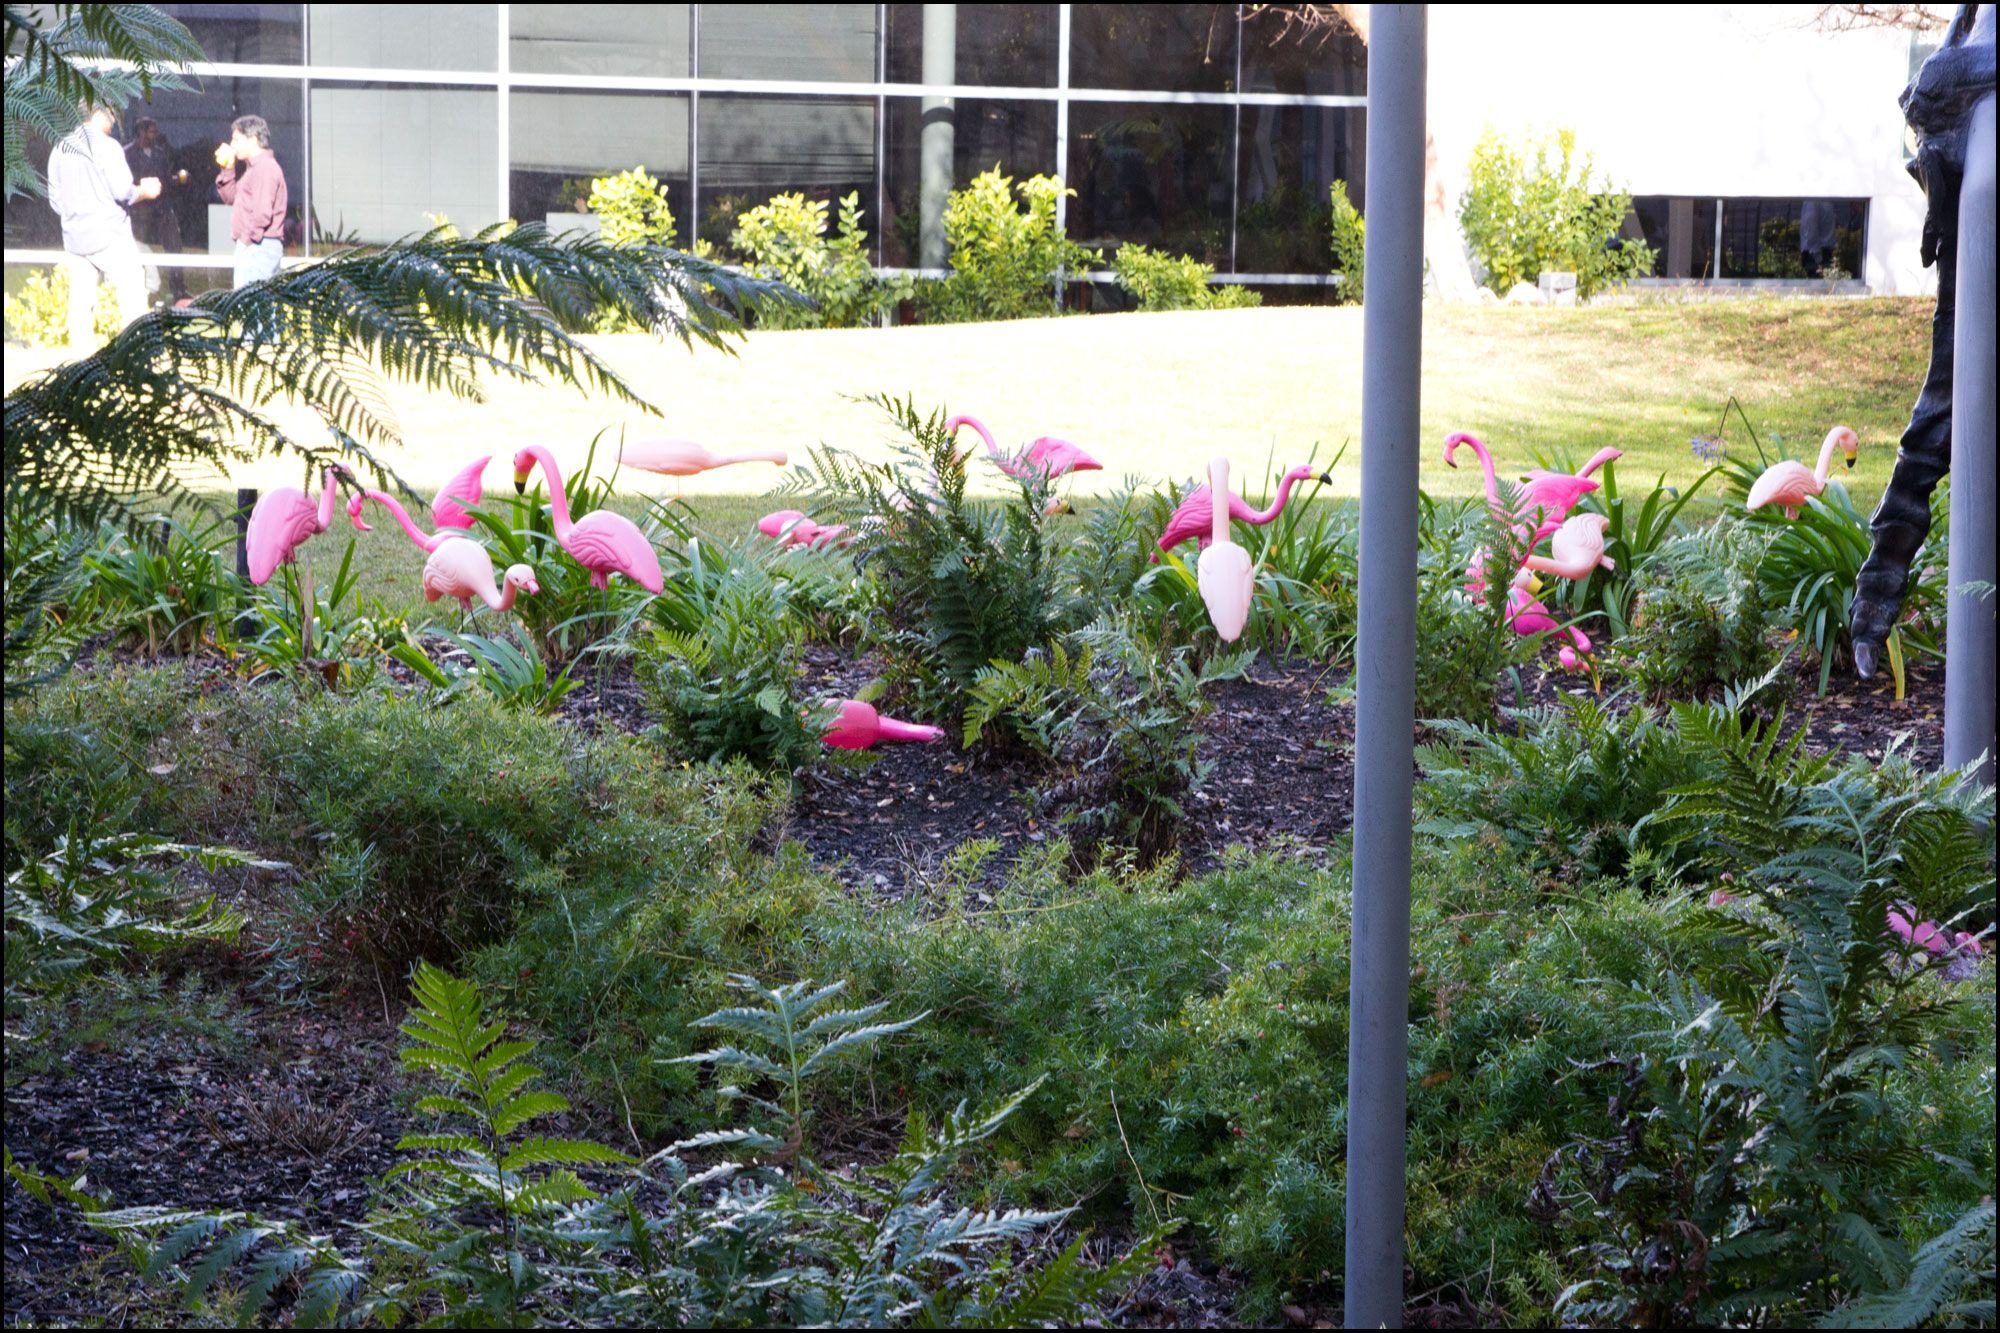 Rosa flamingoer, hos Google